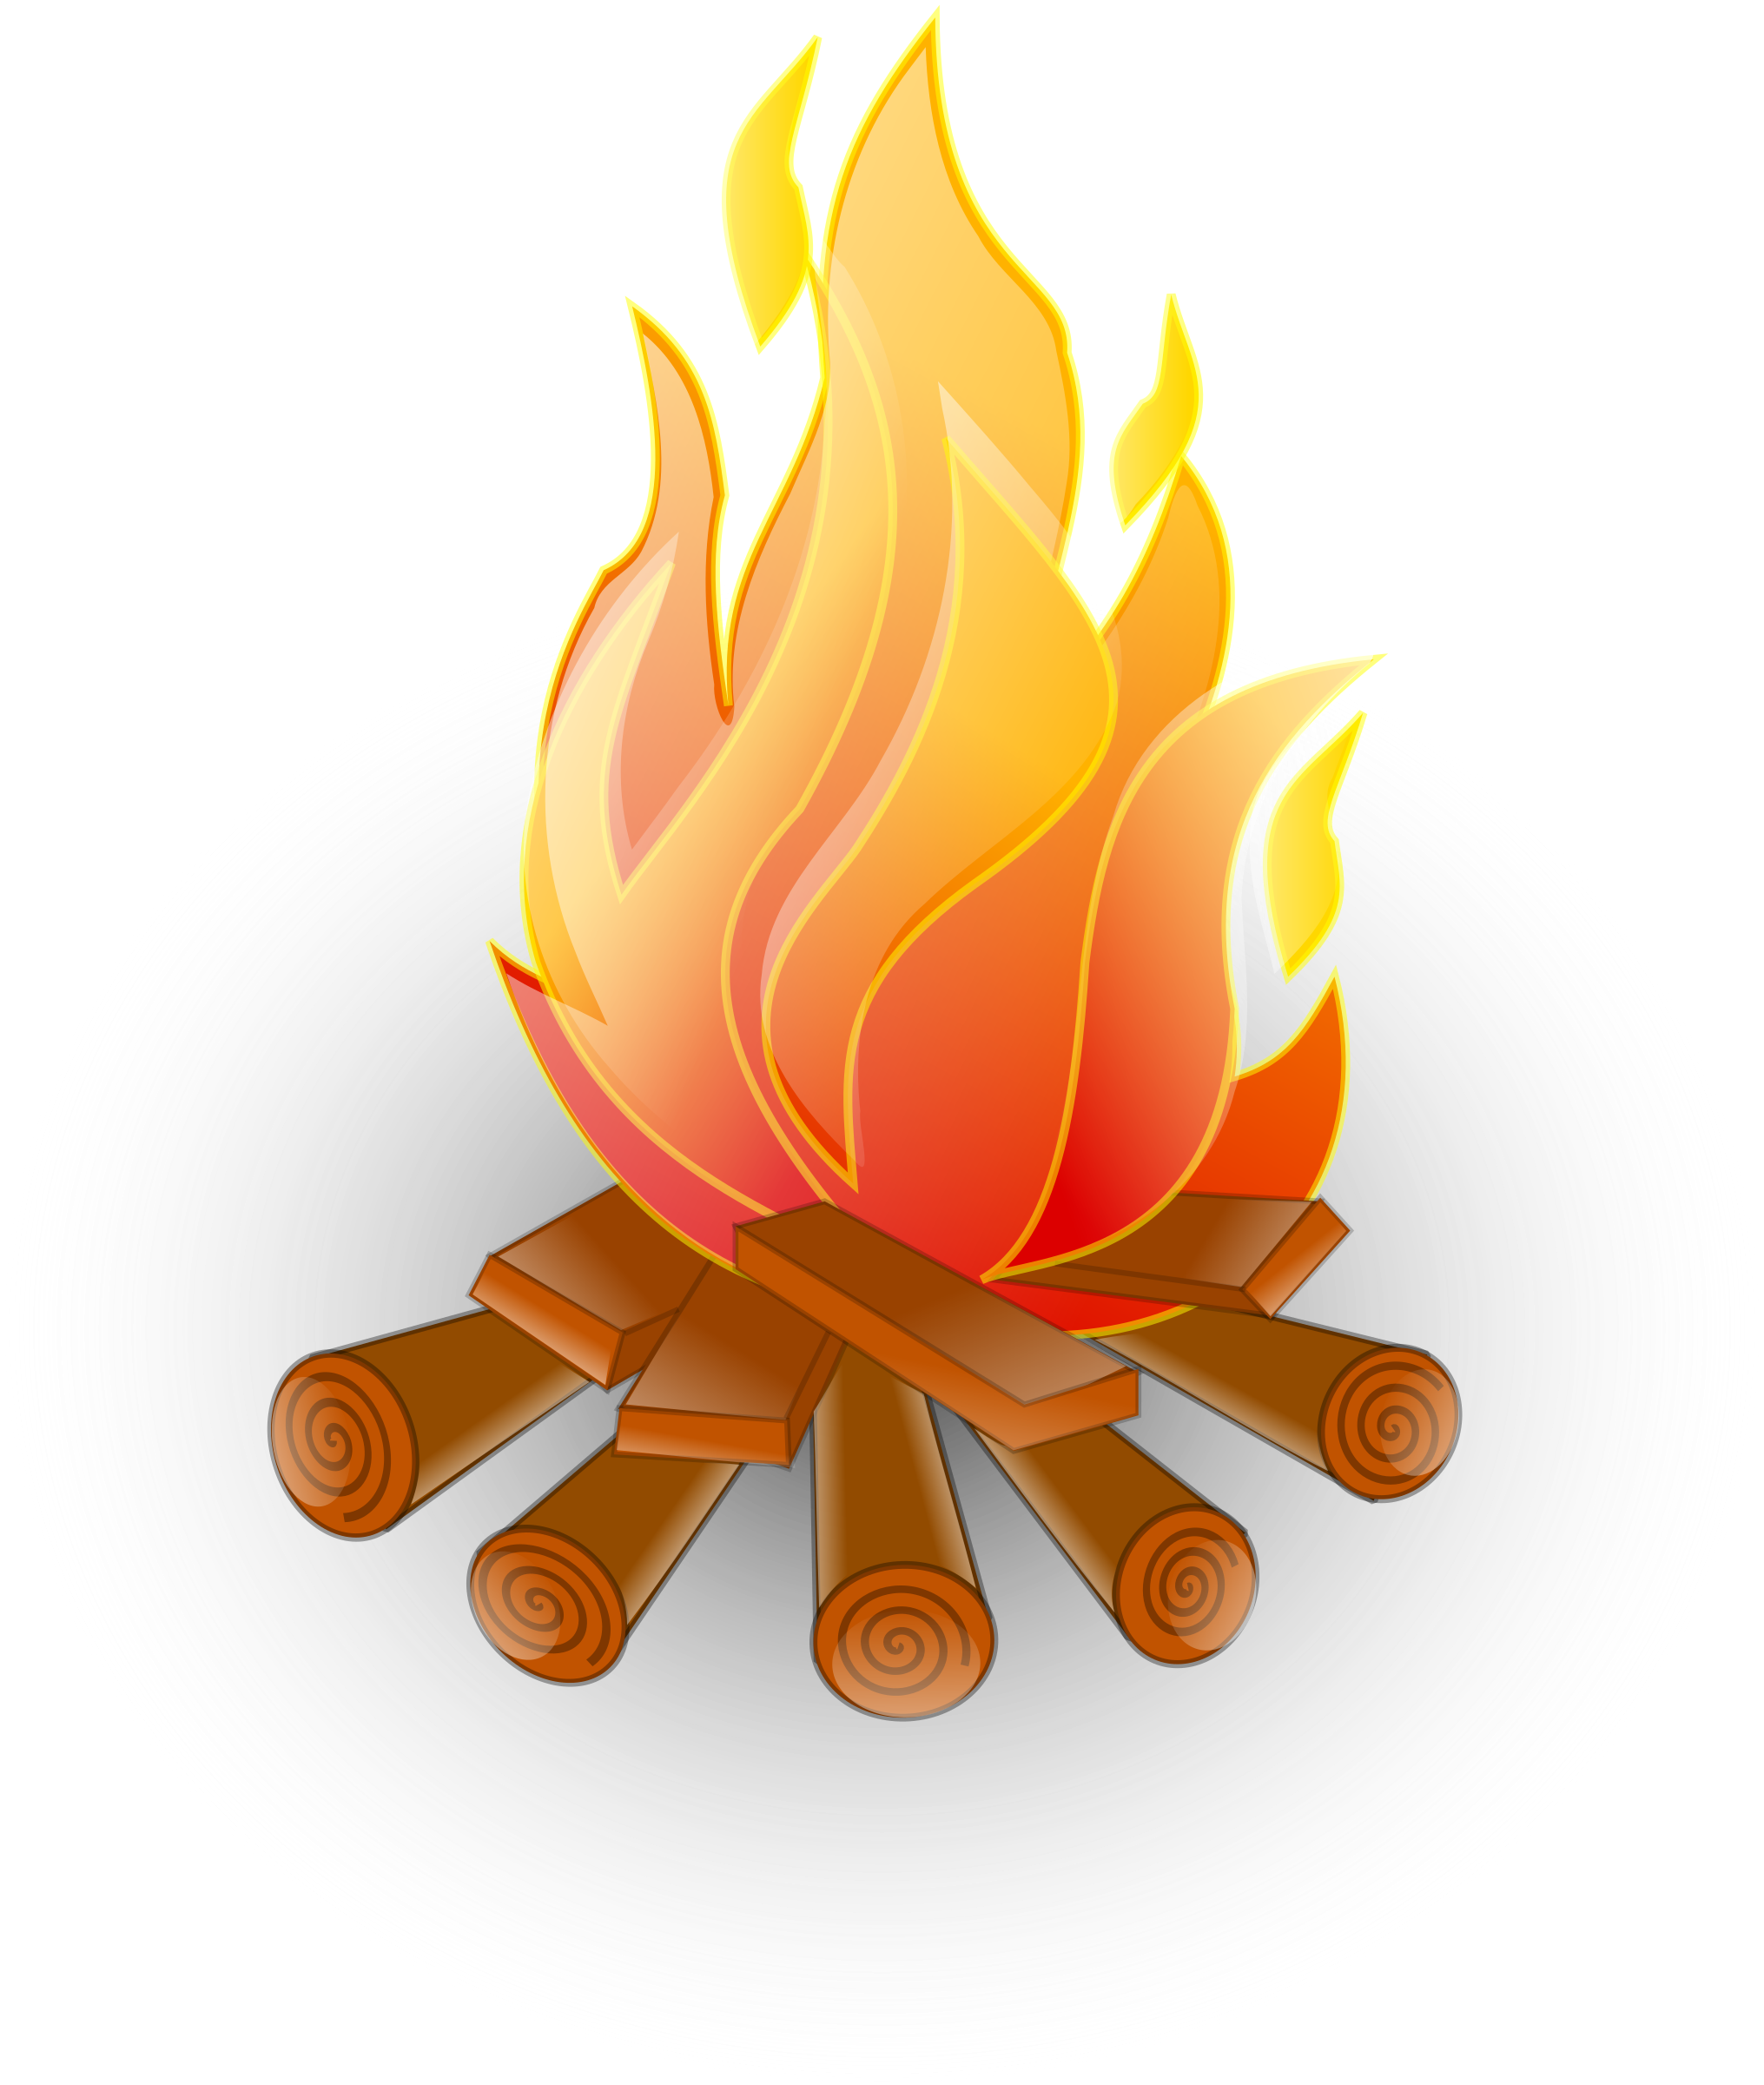 Fire clipart illustration. Big image png